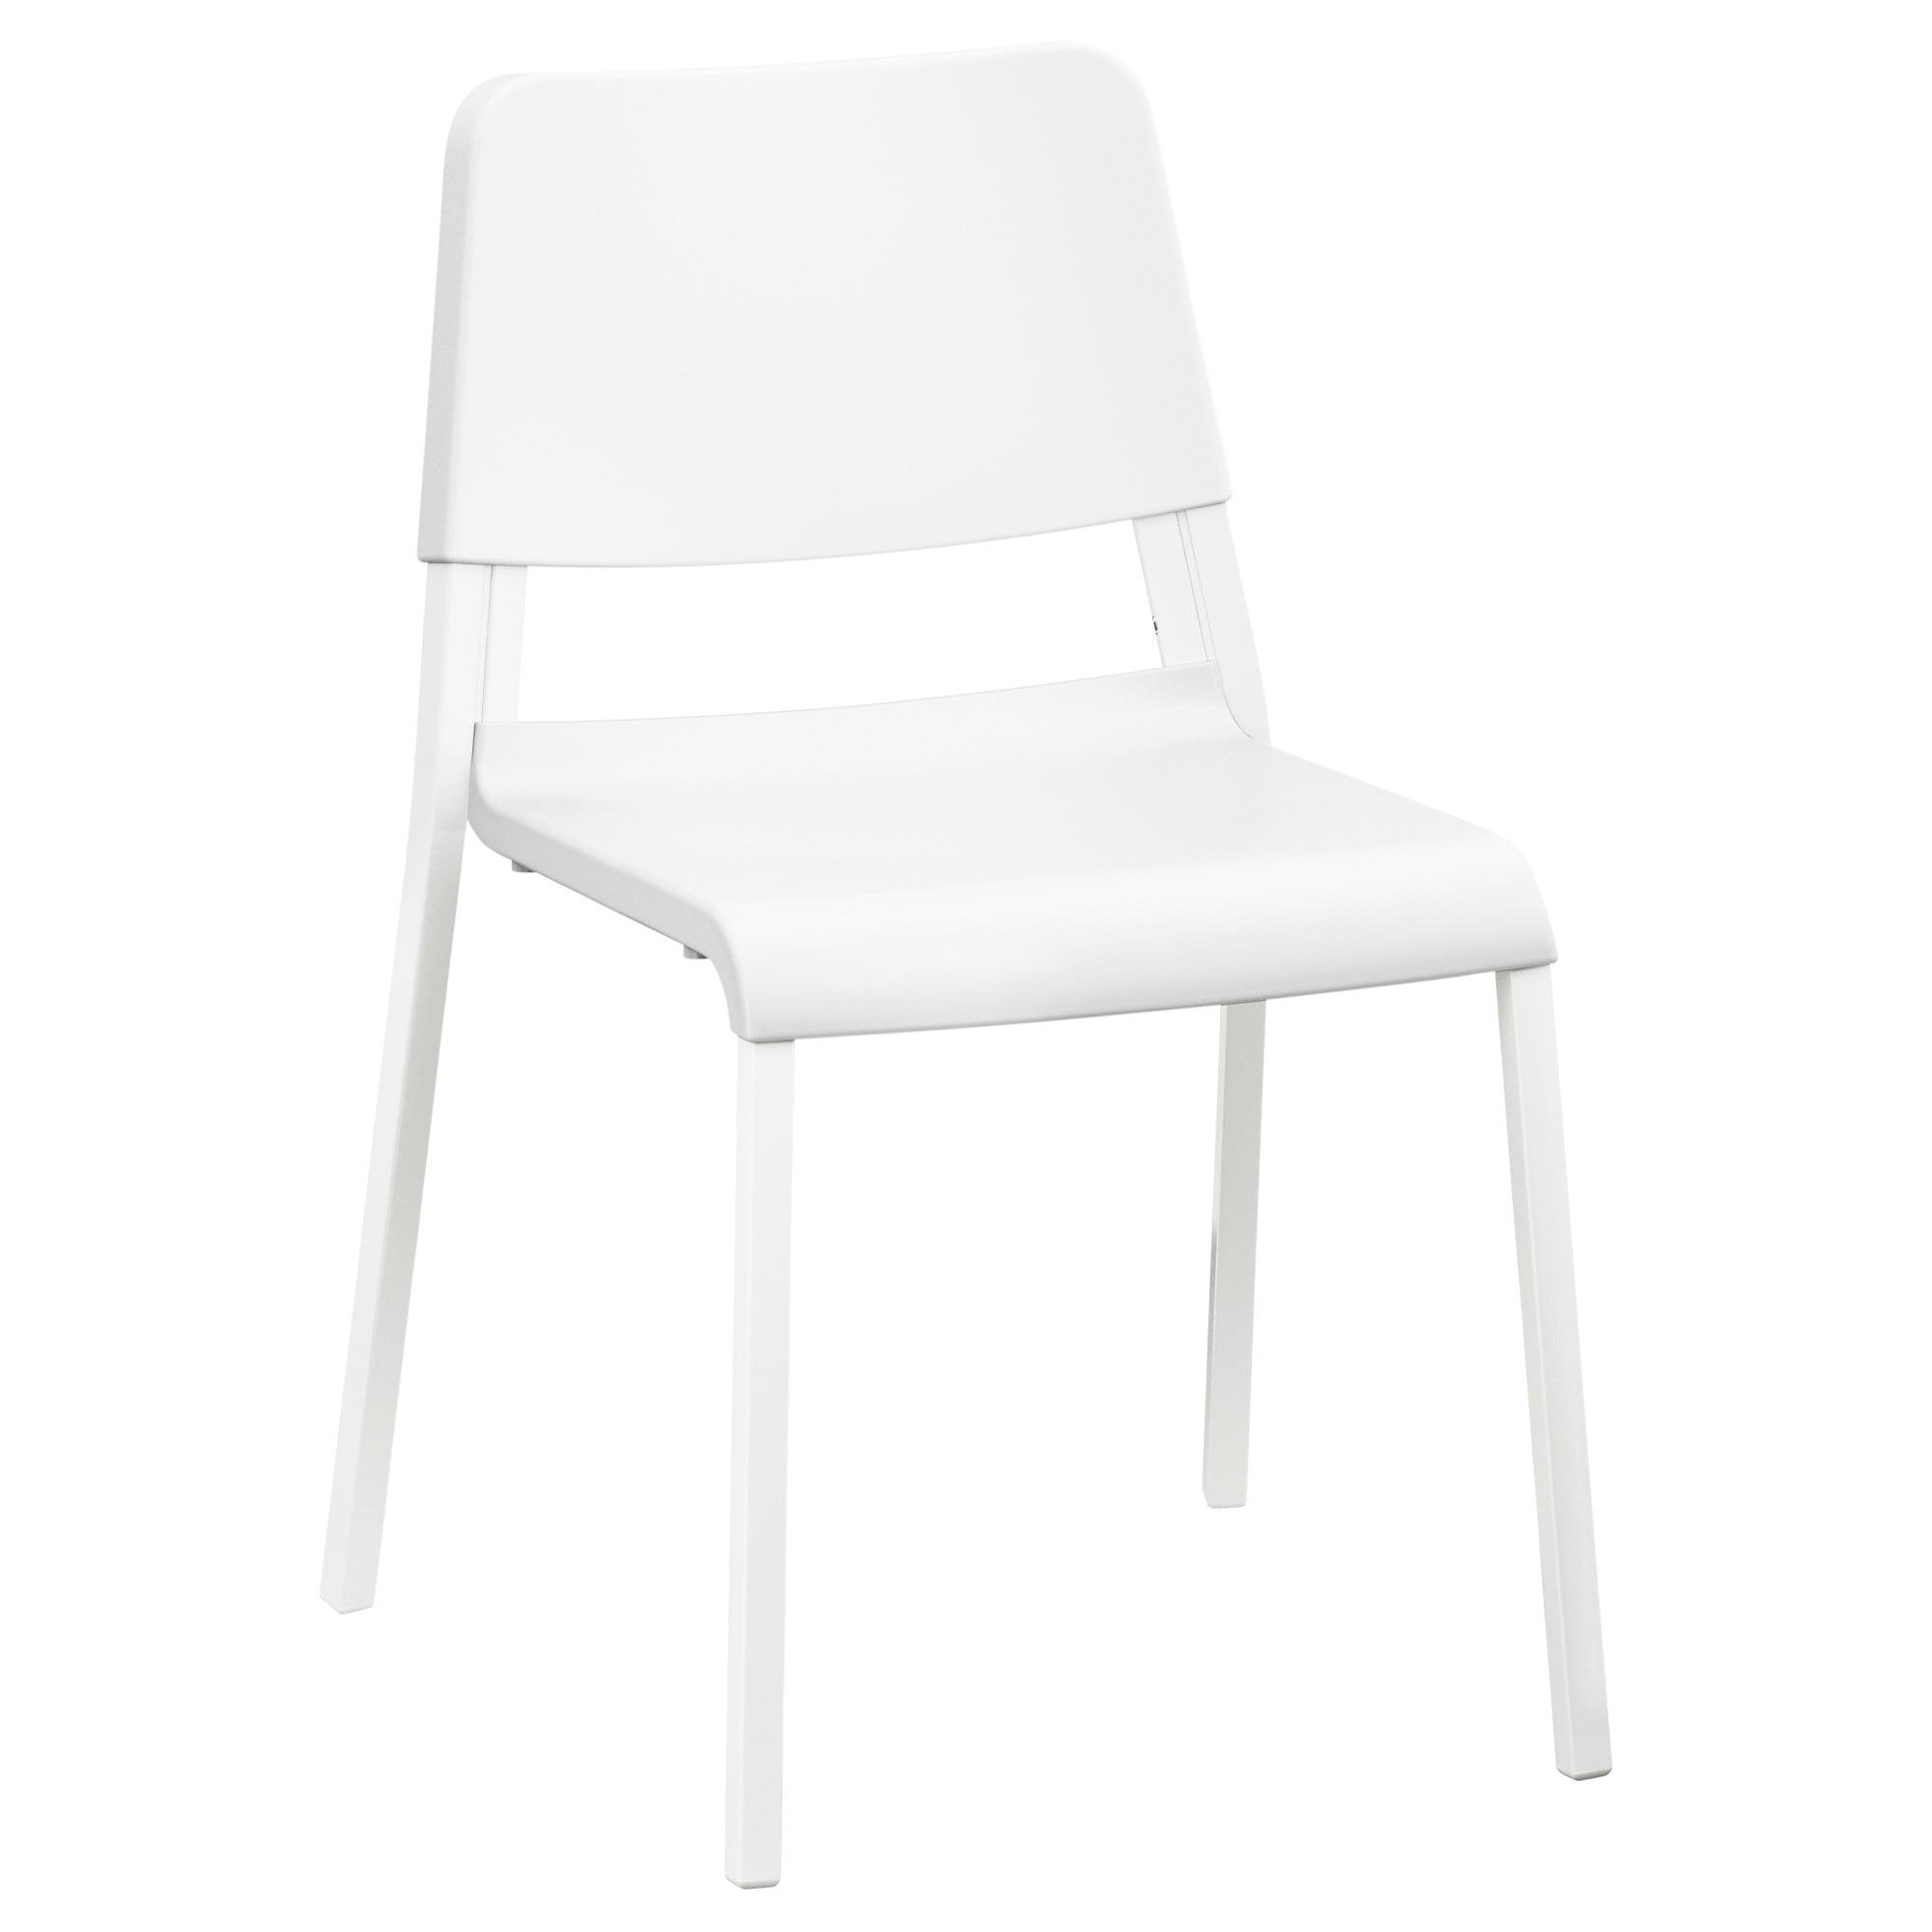 Sillas Blancas Ikea Zwd9 Teodores Silla Blanco Ikea